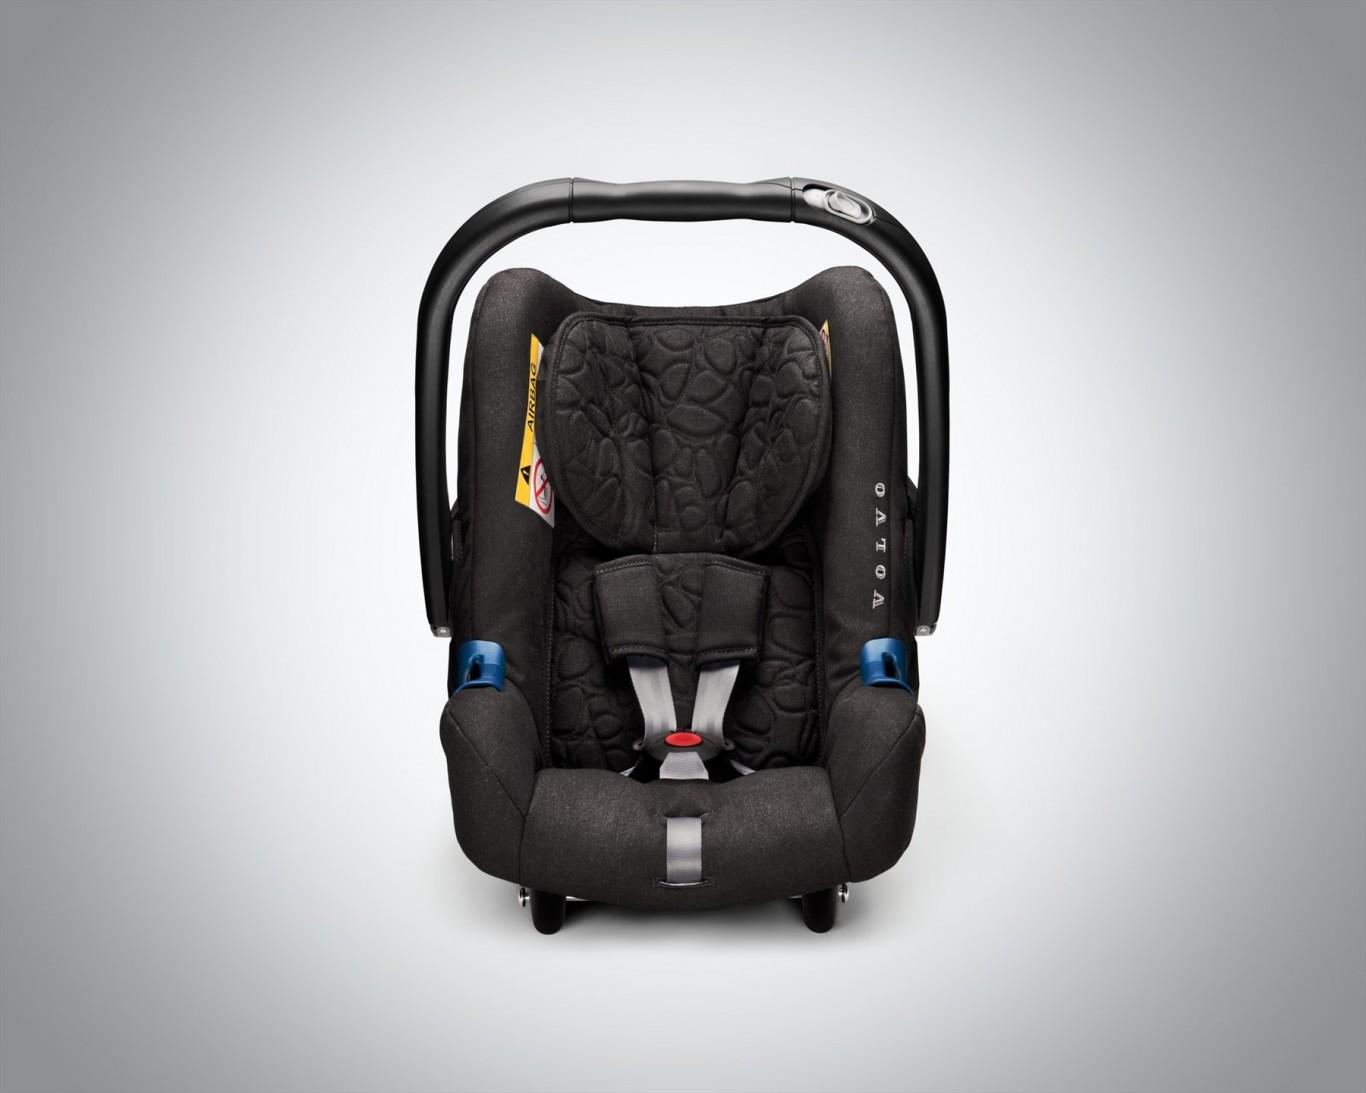 190597_volvo_cars_new_generation_child_seats_1800x1800